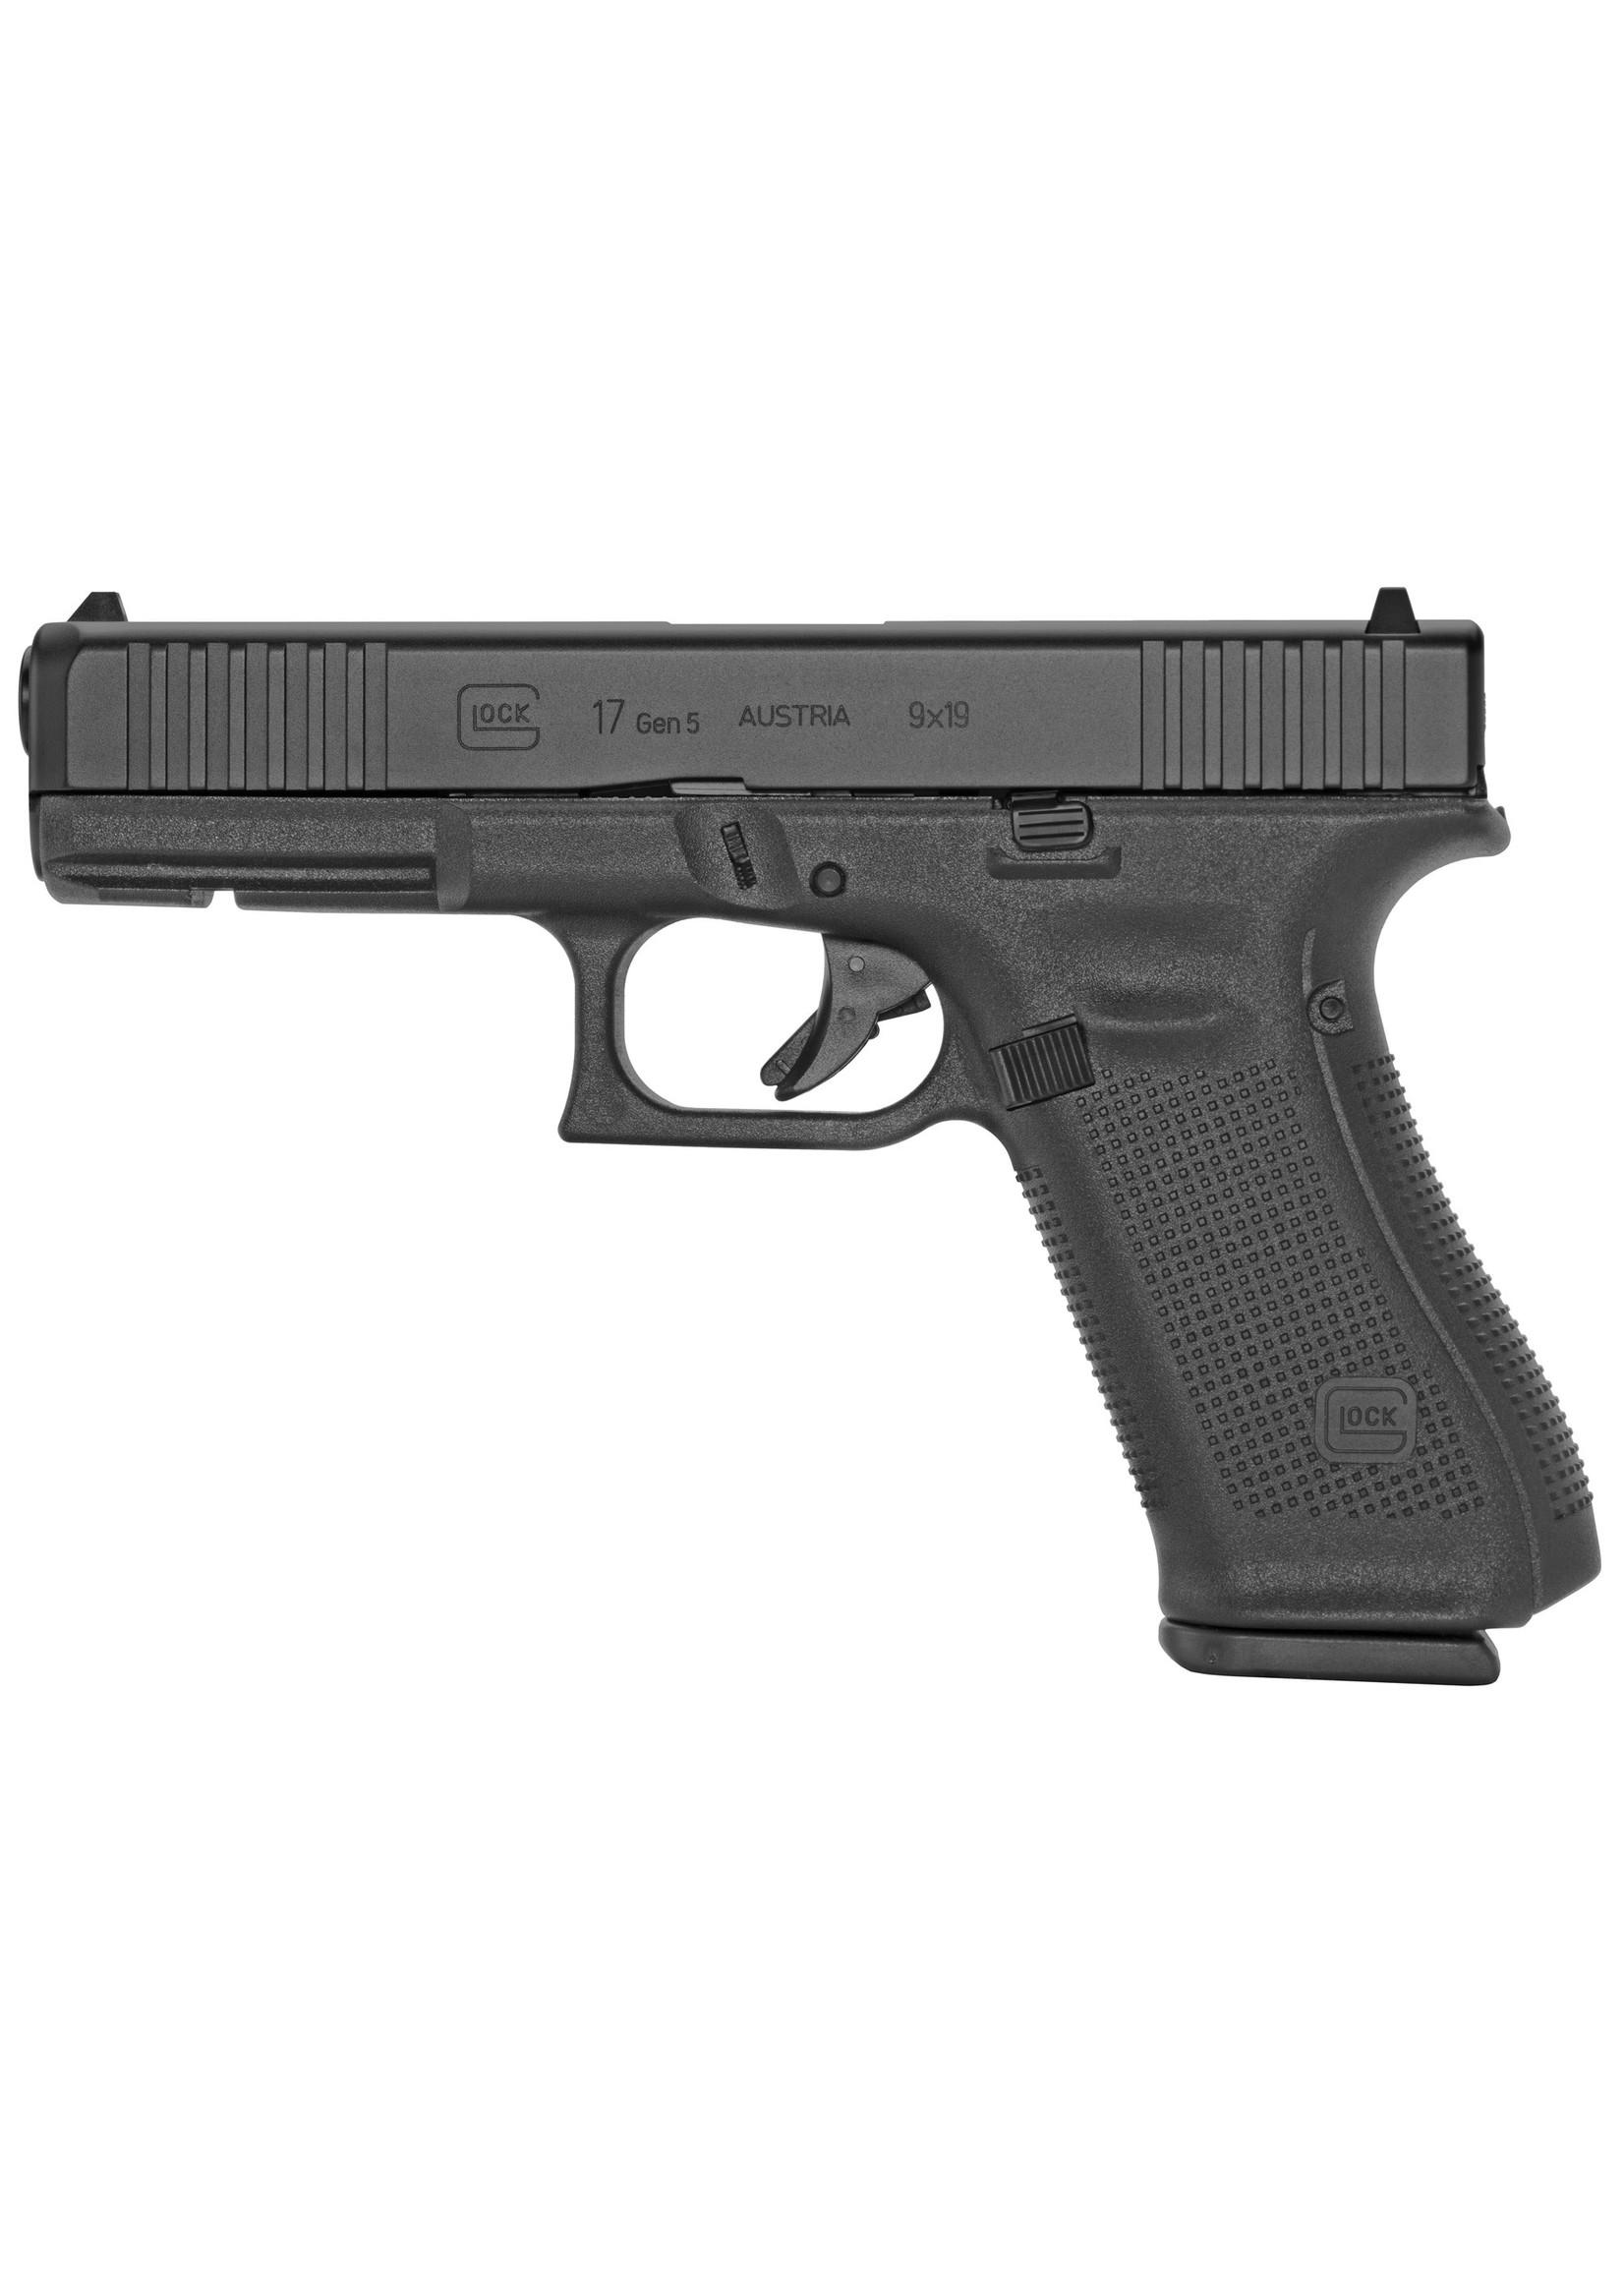 "Glock Glock 19  G3,  9MM, 4.02"" Barrel, Polymer Frame, Matte Finish, Fixed Sights, 15Rd, 2 Magazines"